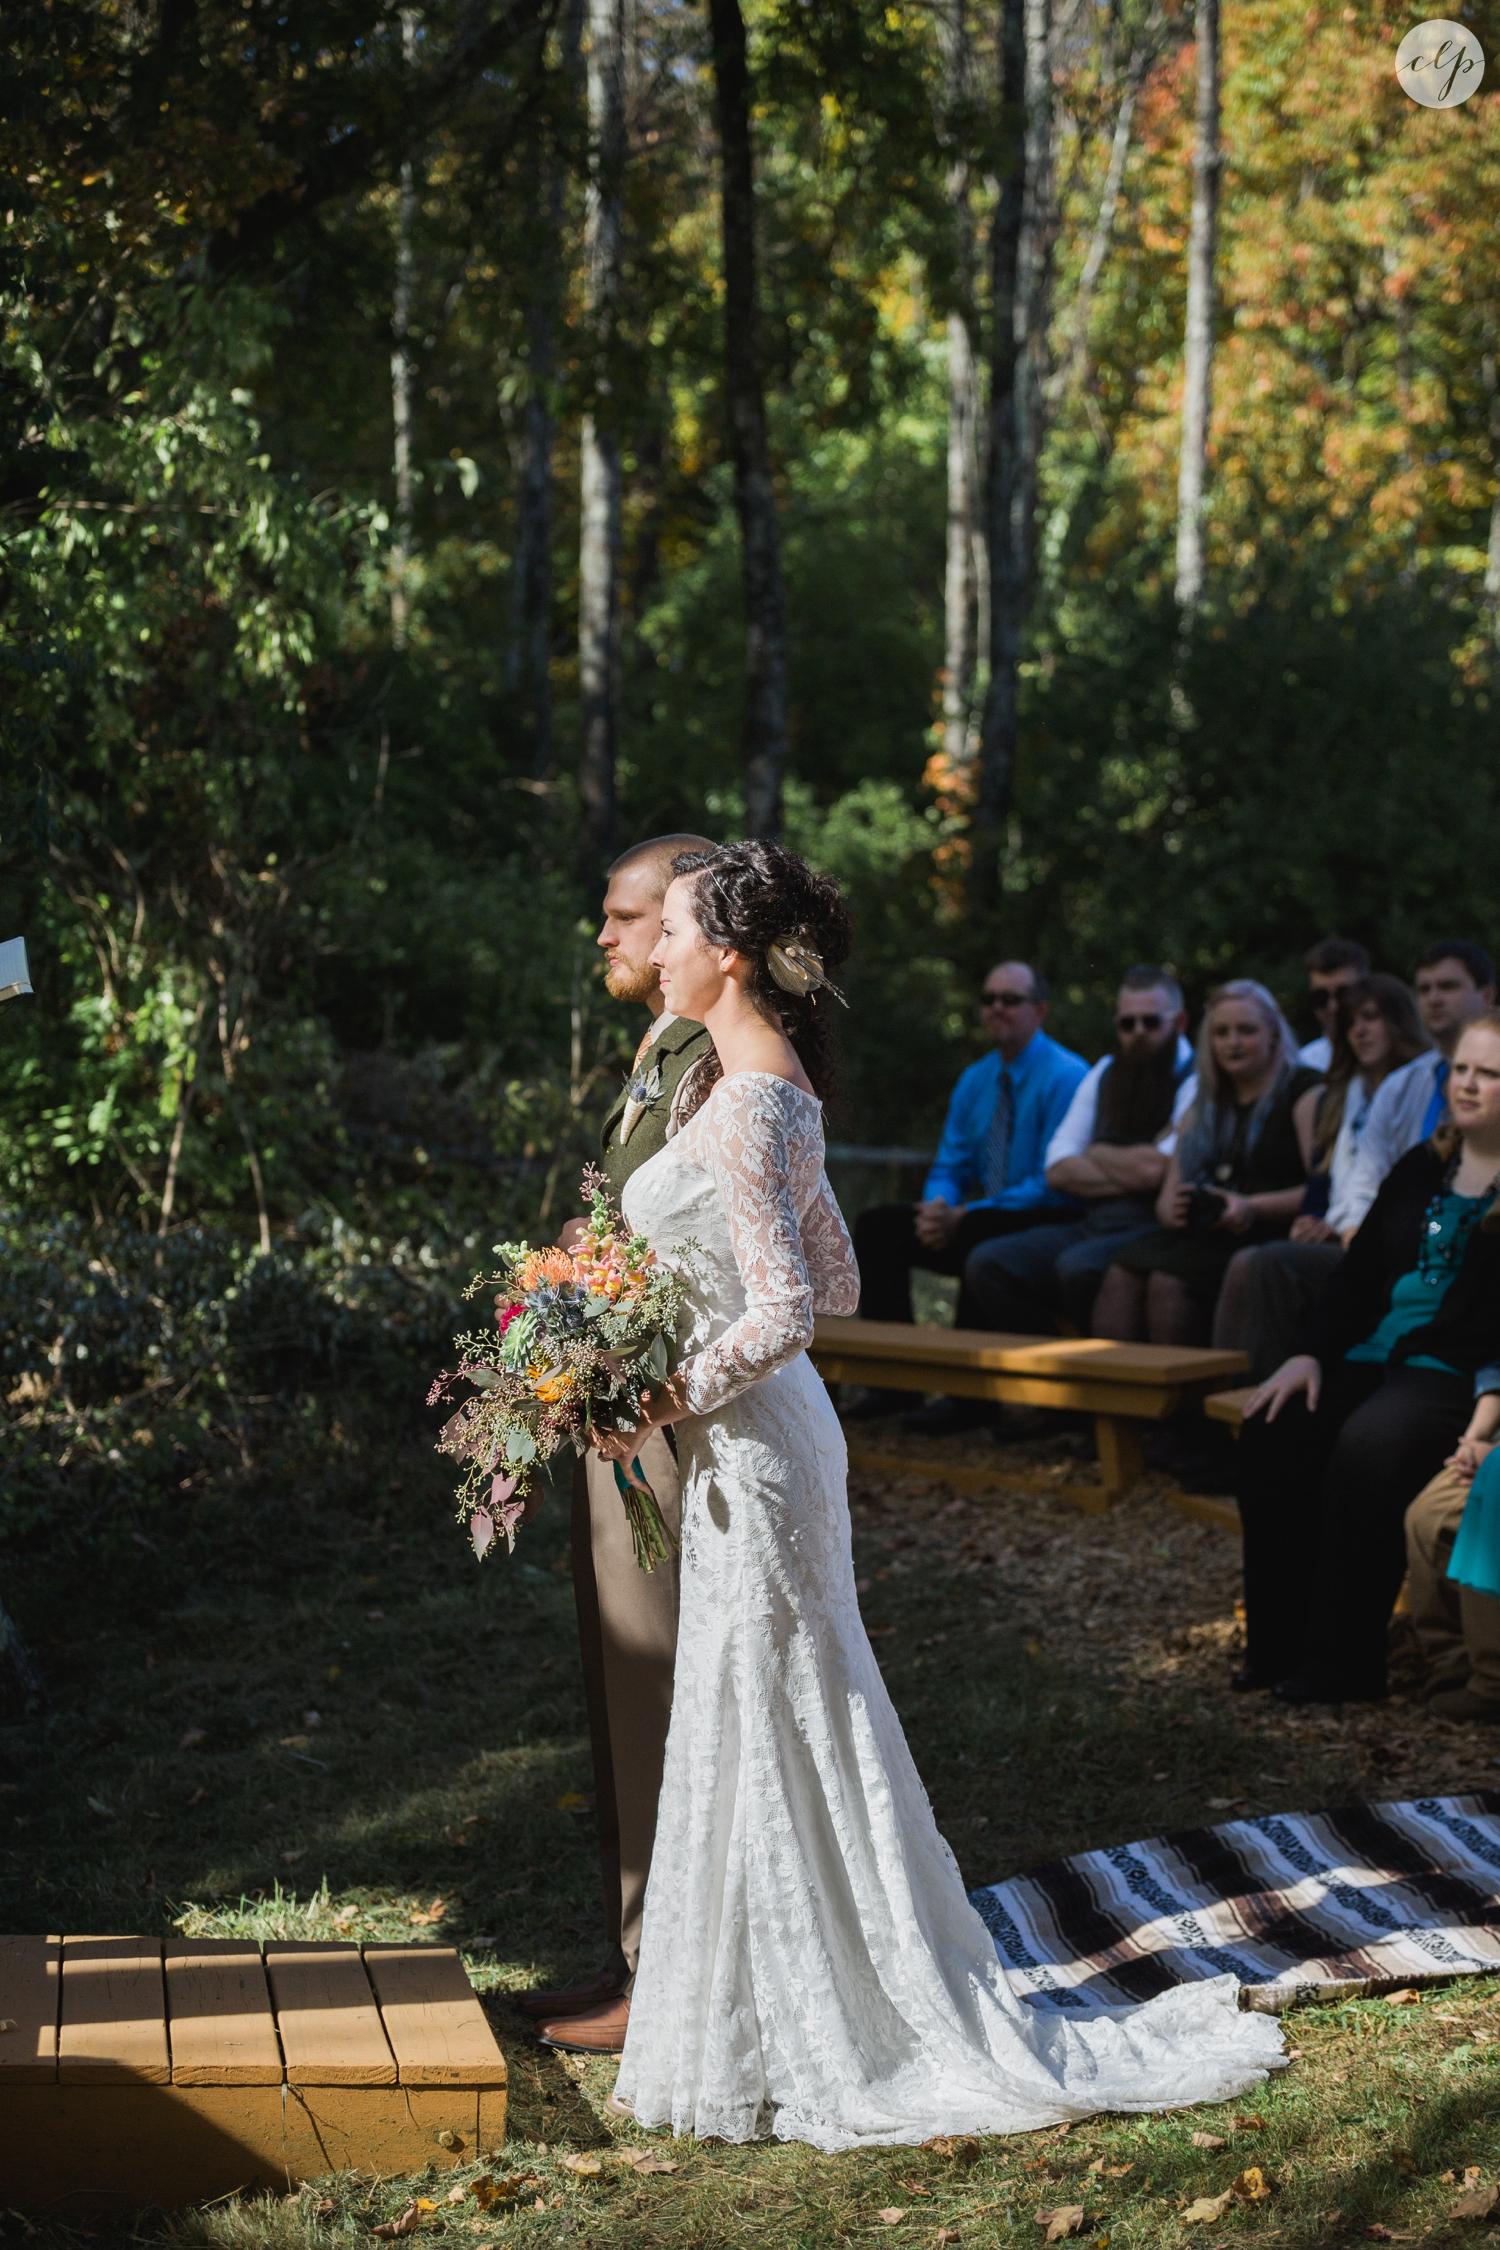 Outdoor-Wedding-in-the-Woods-Photography_4249.jpg